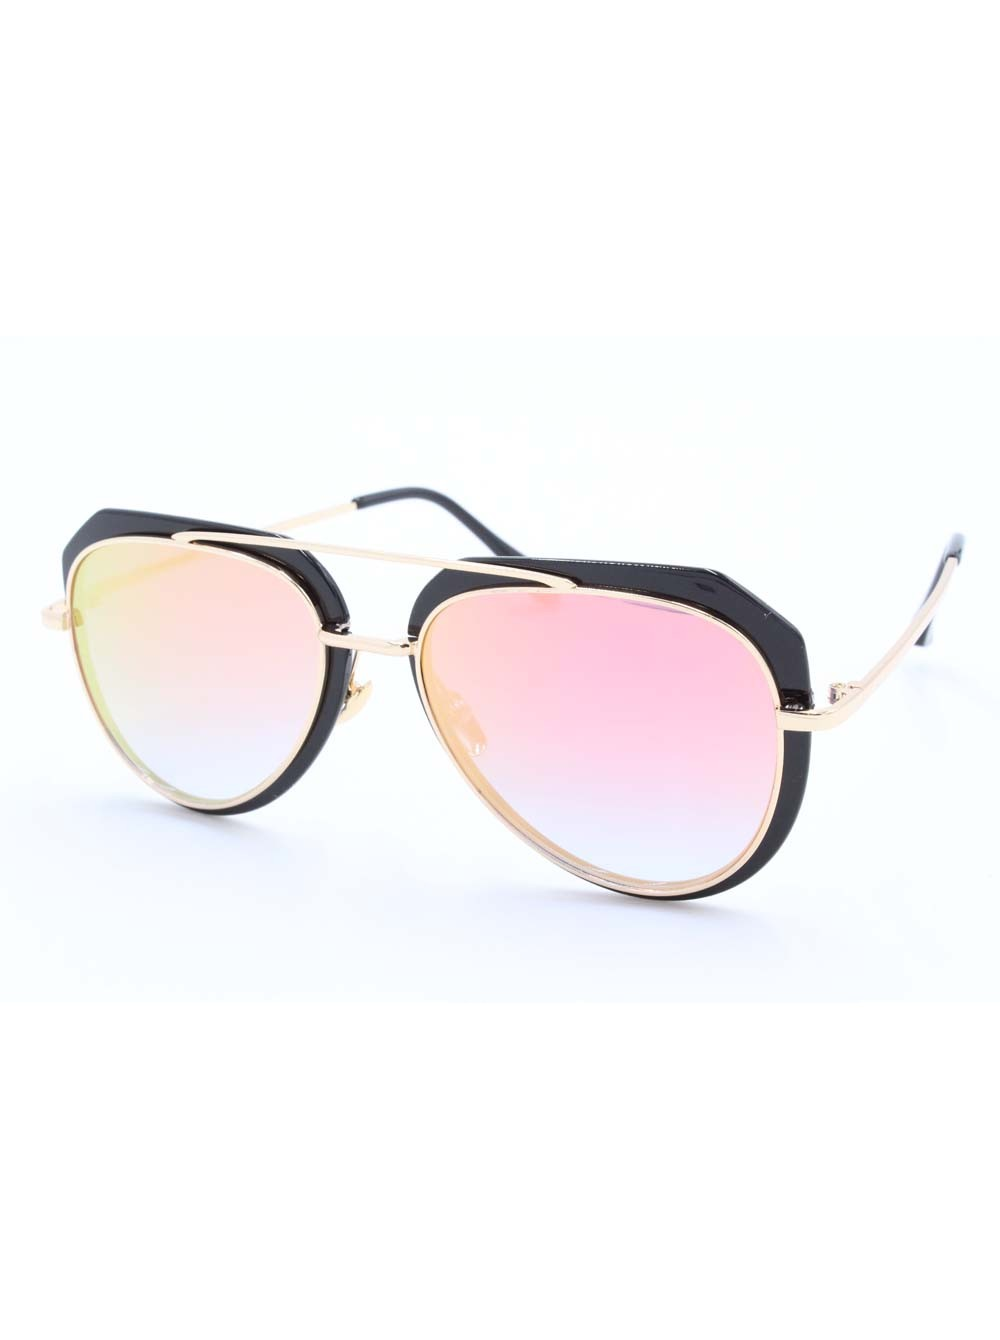 Очки-Эксклюзив- N3516